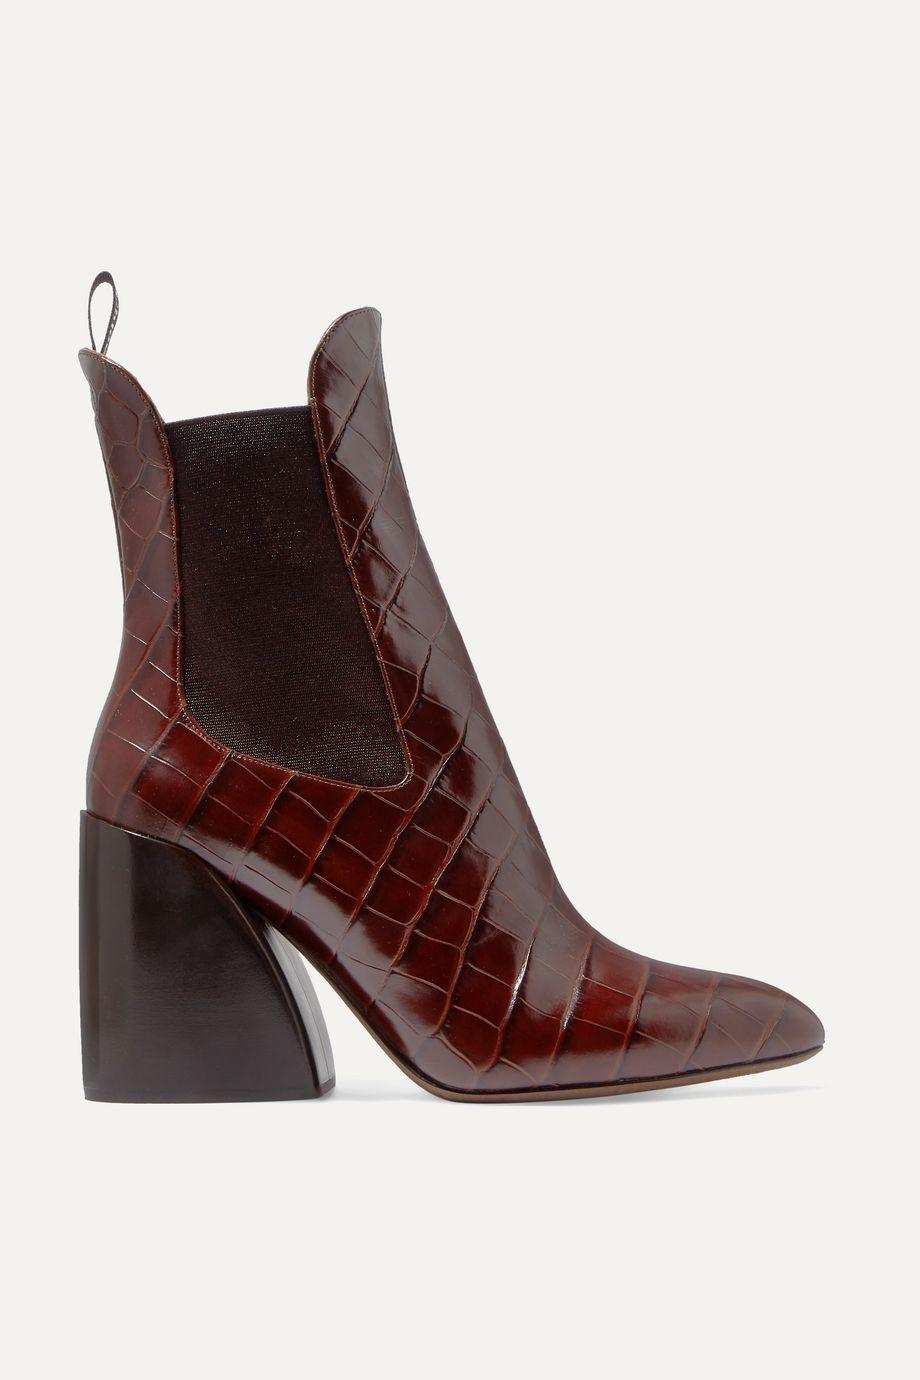 Chloé Wave croc-effect leather ankle boots